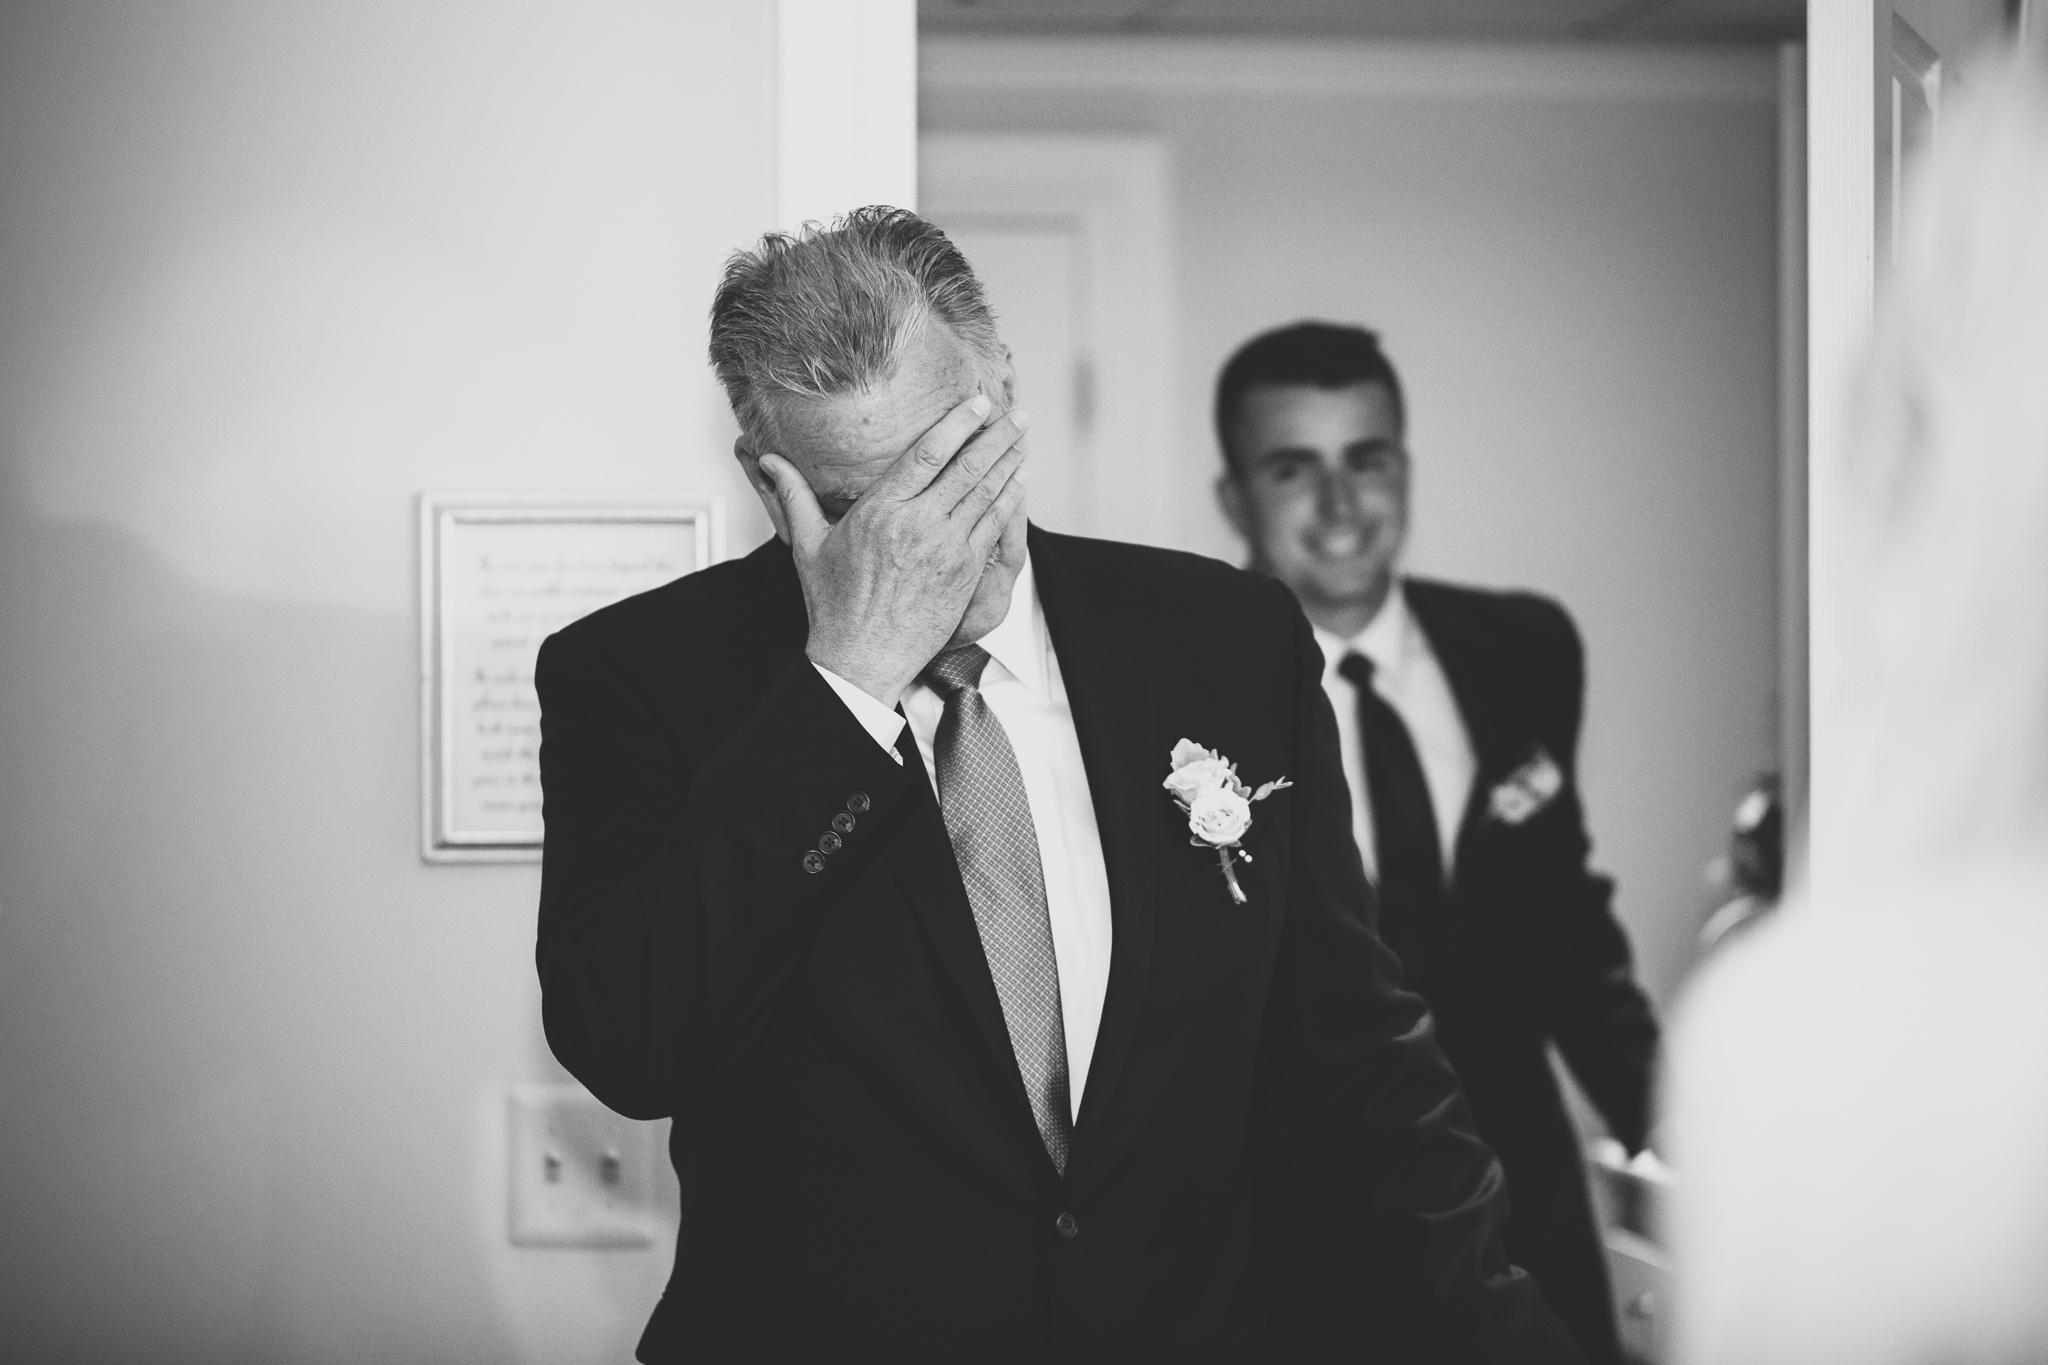 018-best-detroit-michigan-outdoor-wedding-photographer.jpg